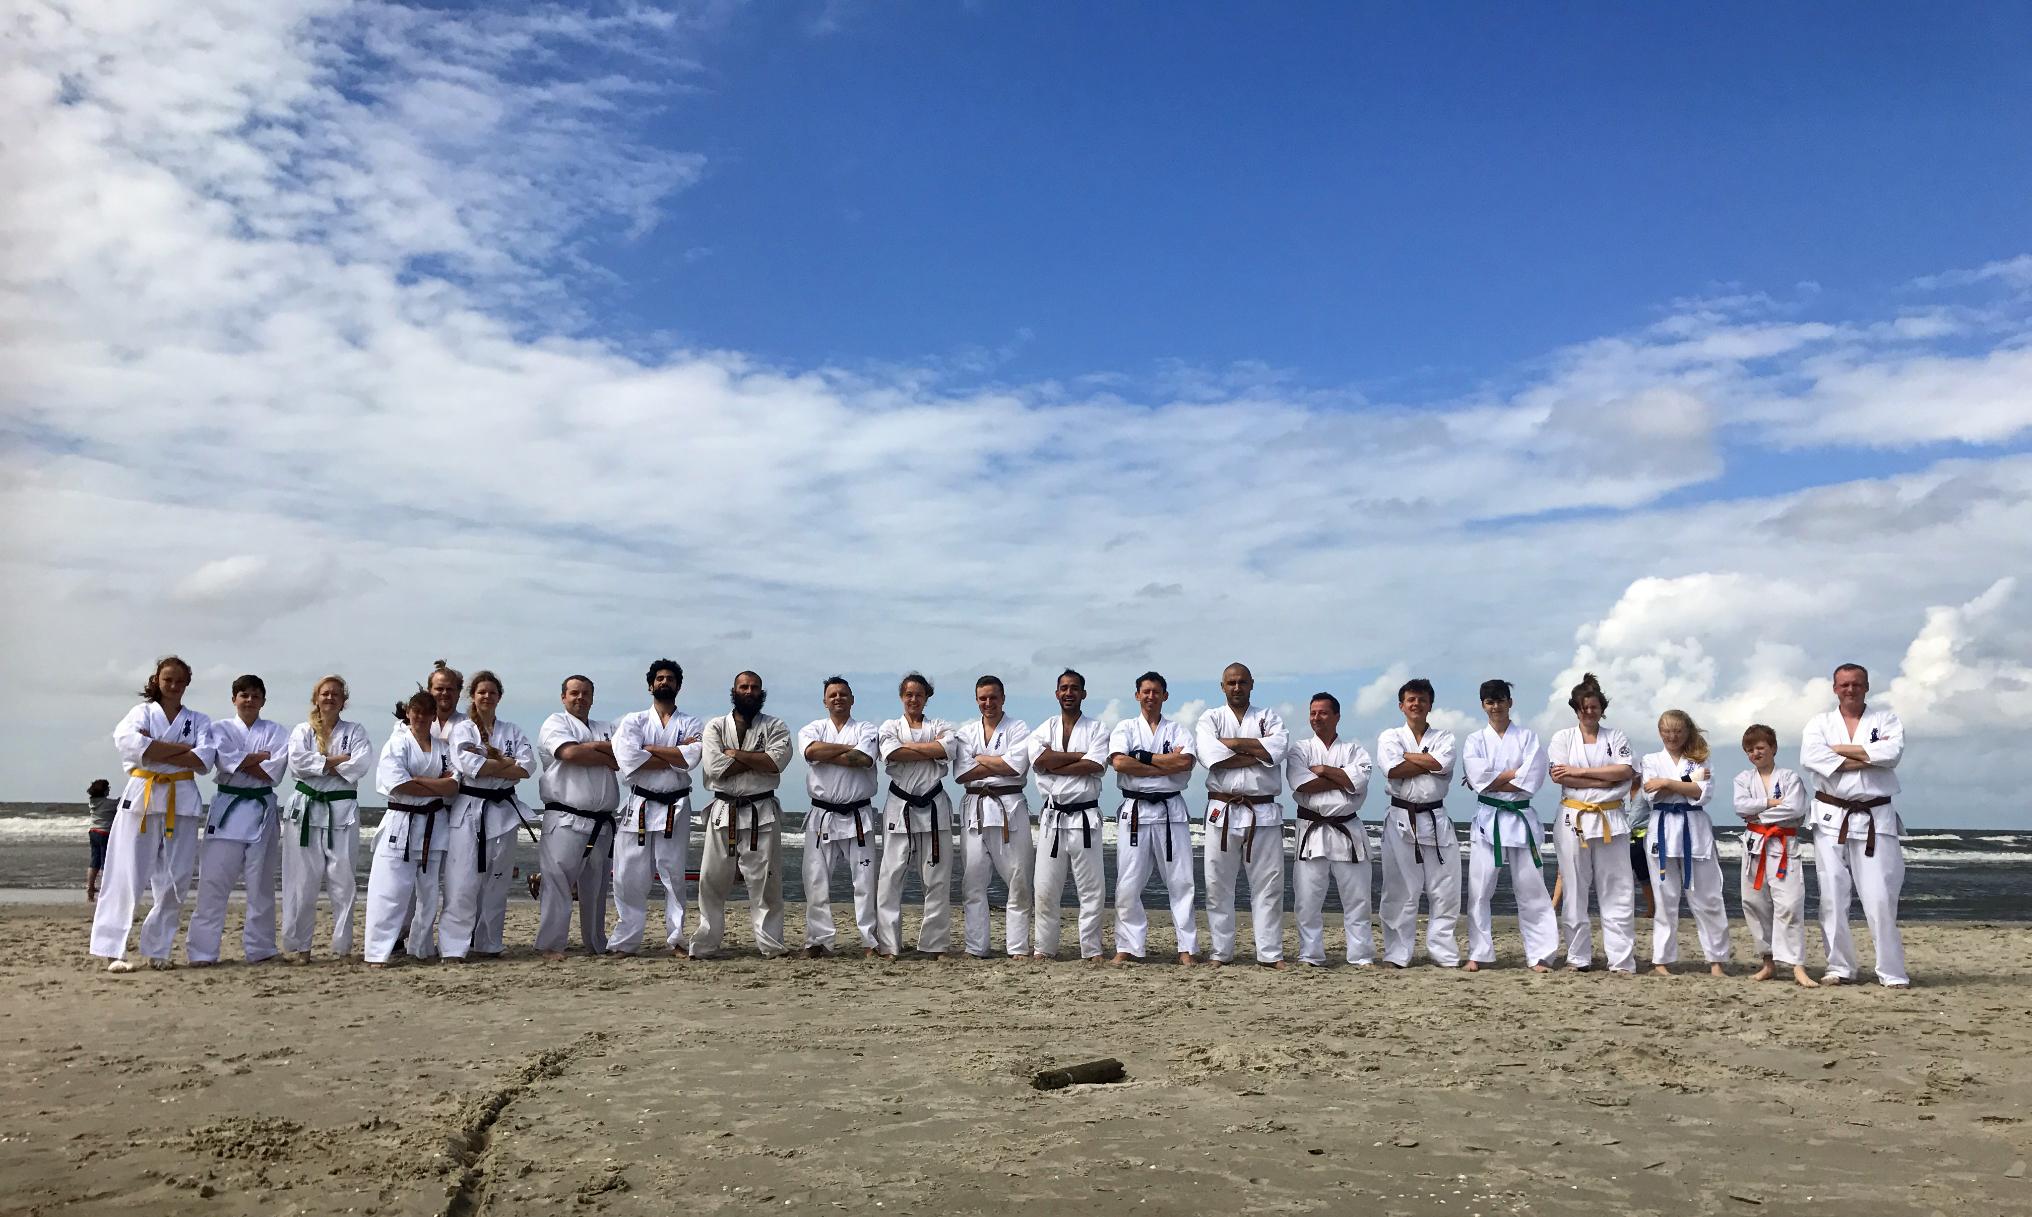 IKO_Kyokushinkaikan_Deutschland_Sommercamp